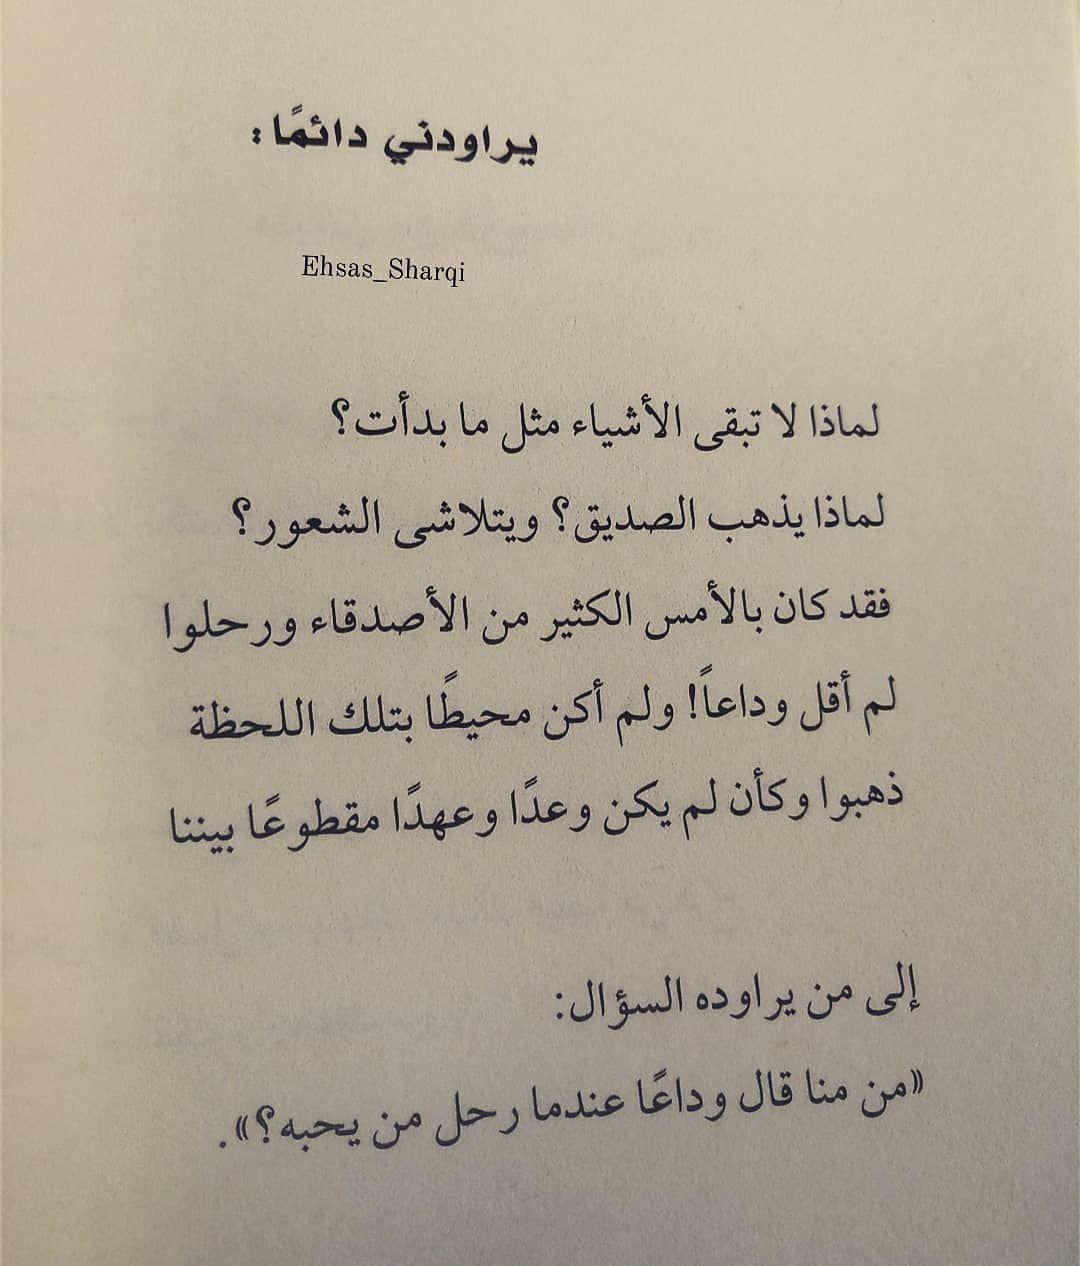 Pin By Mahedi Mahedi On Arabic Words Circle Quotes Happy Quotes Quotes